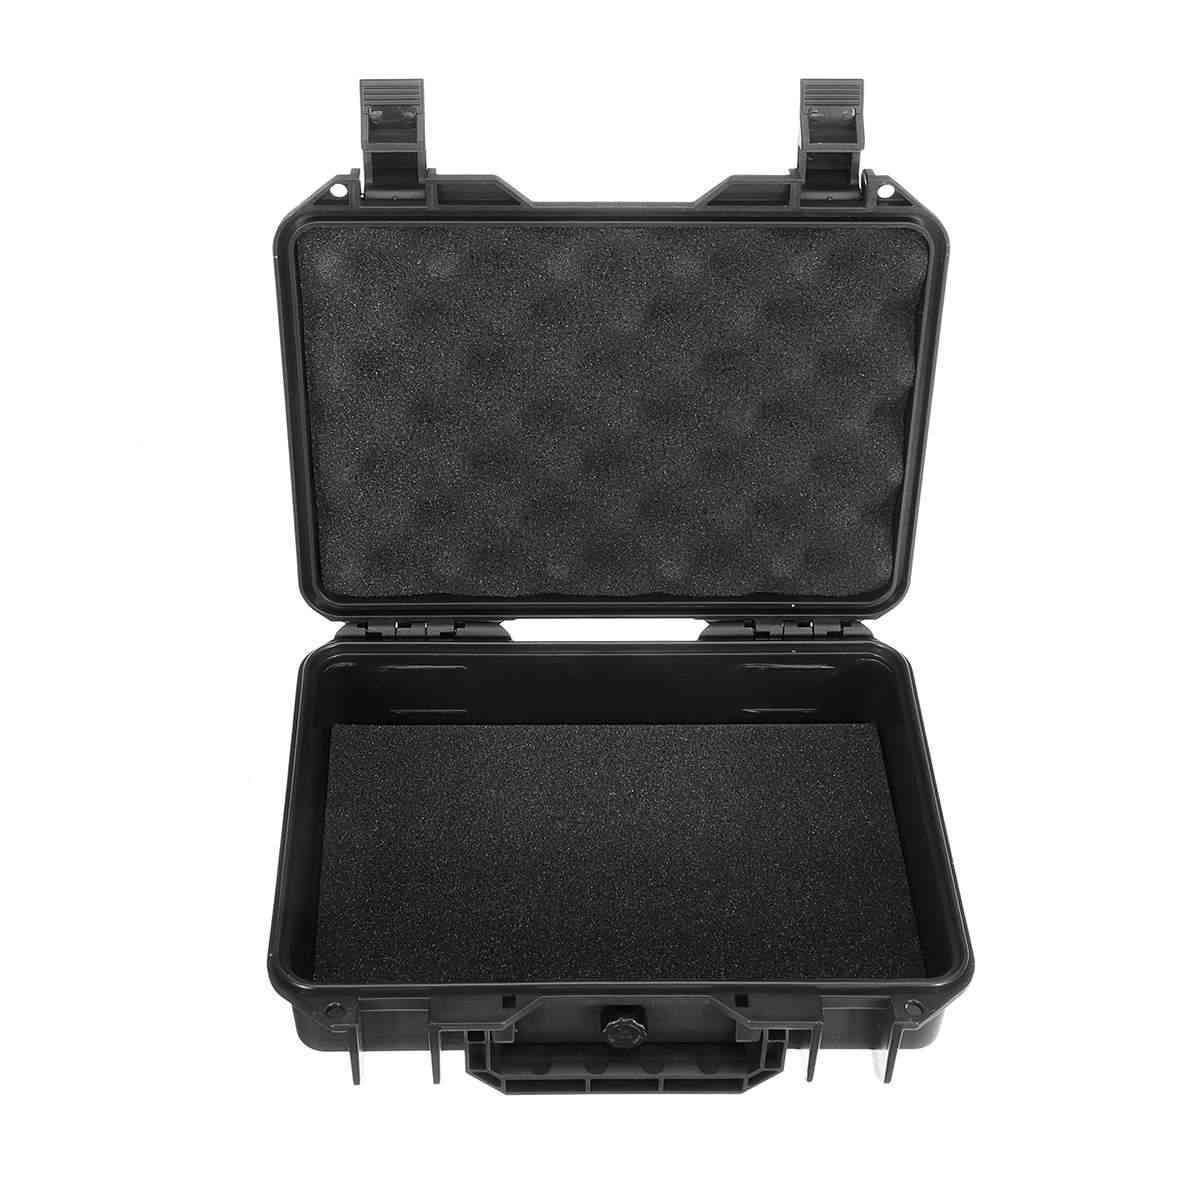 Protective Equipment Hard Flight Carry Case Box